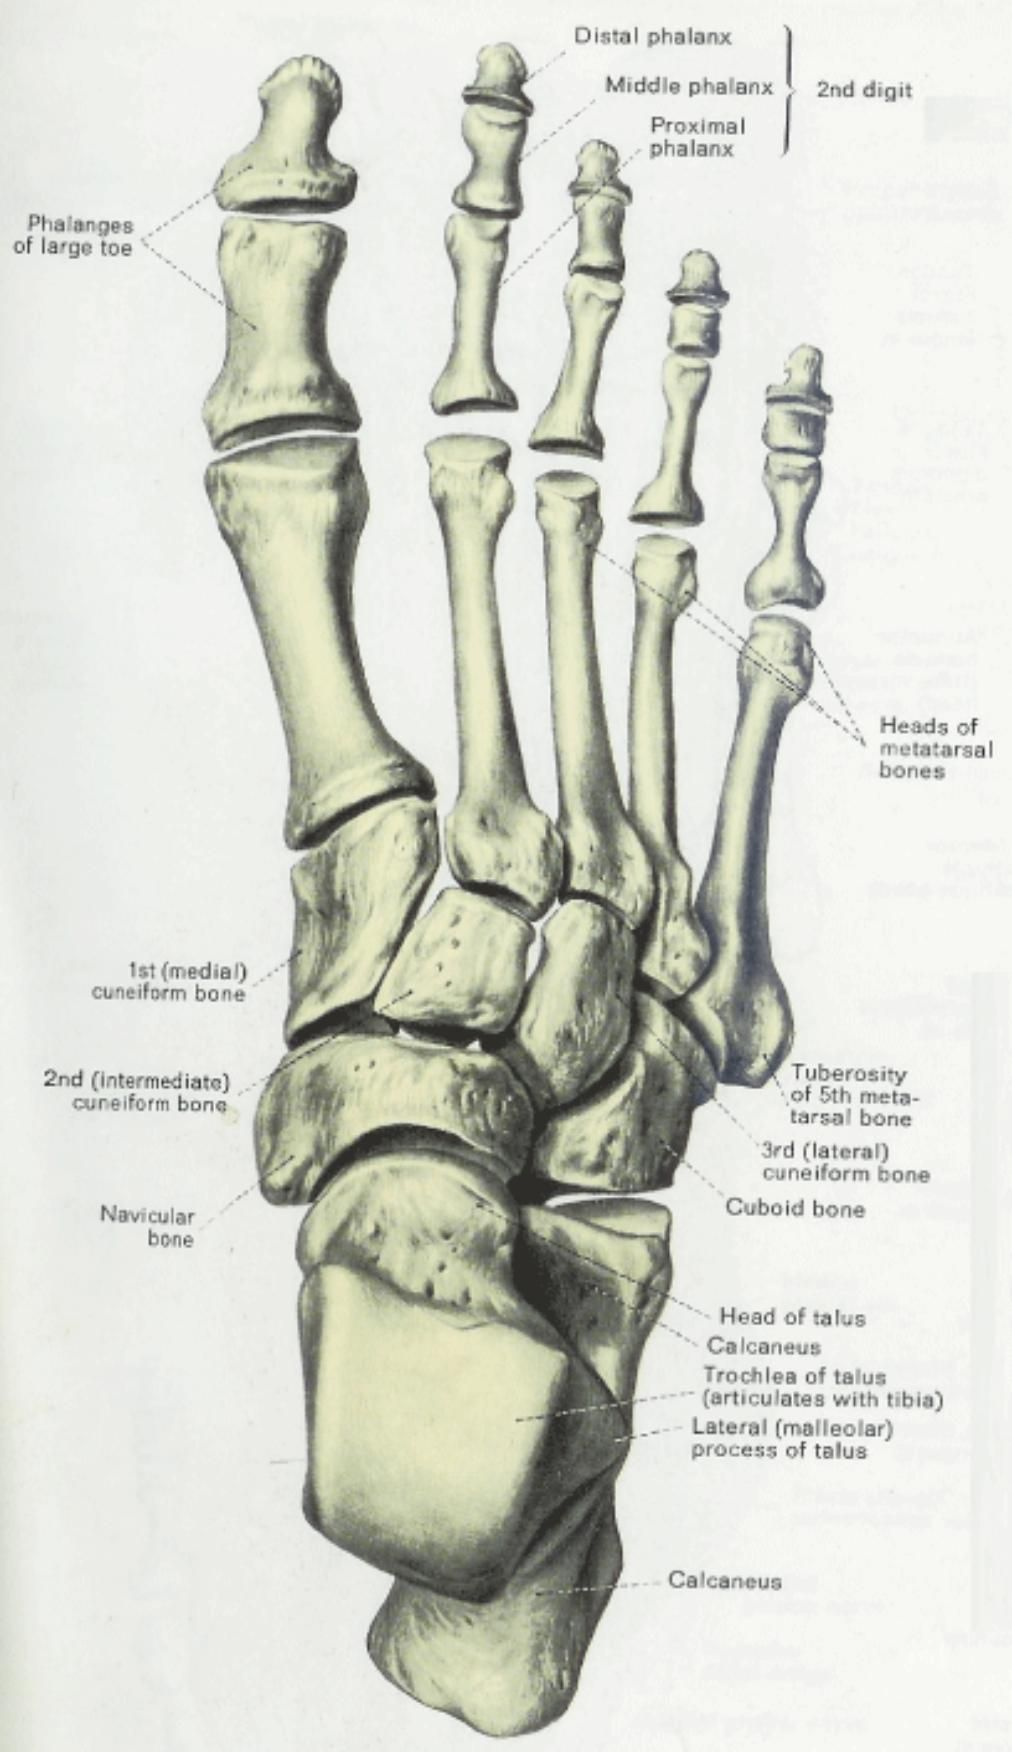 anatomy physiology illustration [ 1012 x 1752 Pixel ]